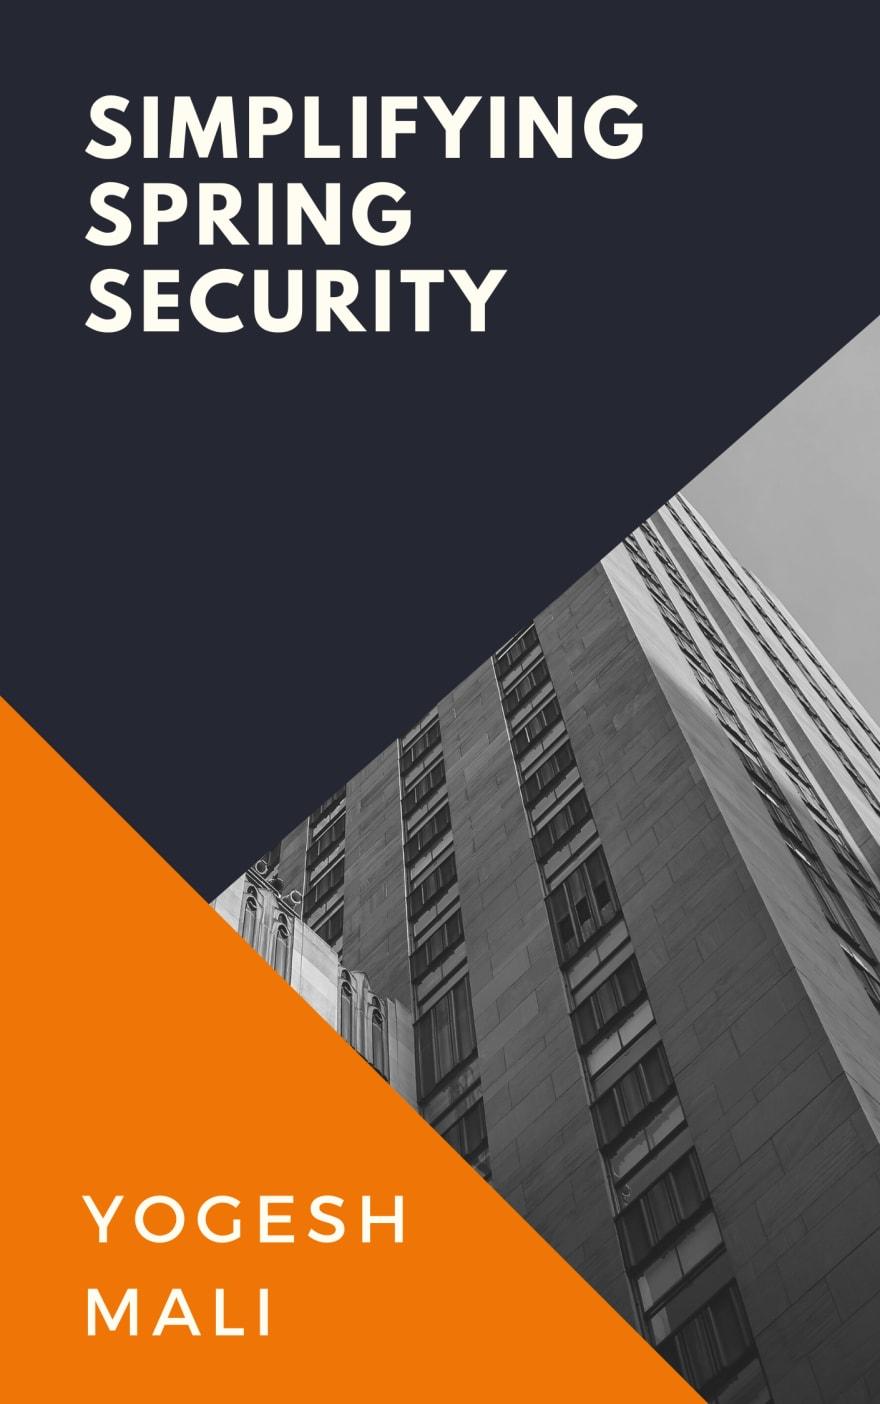 Simplifying Spring Security